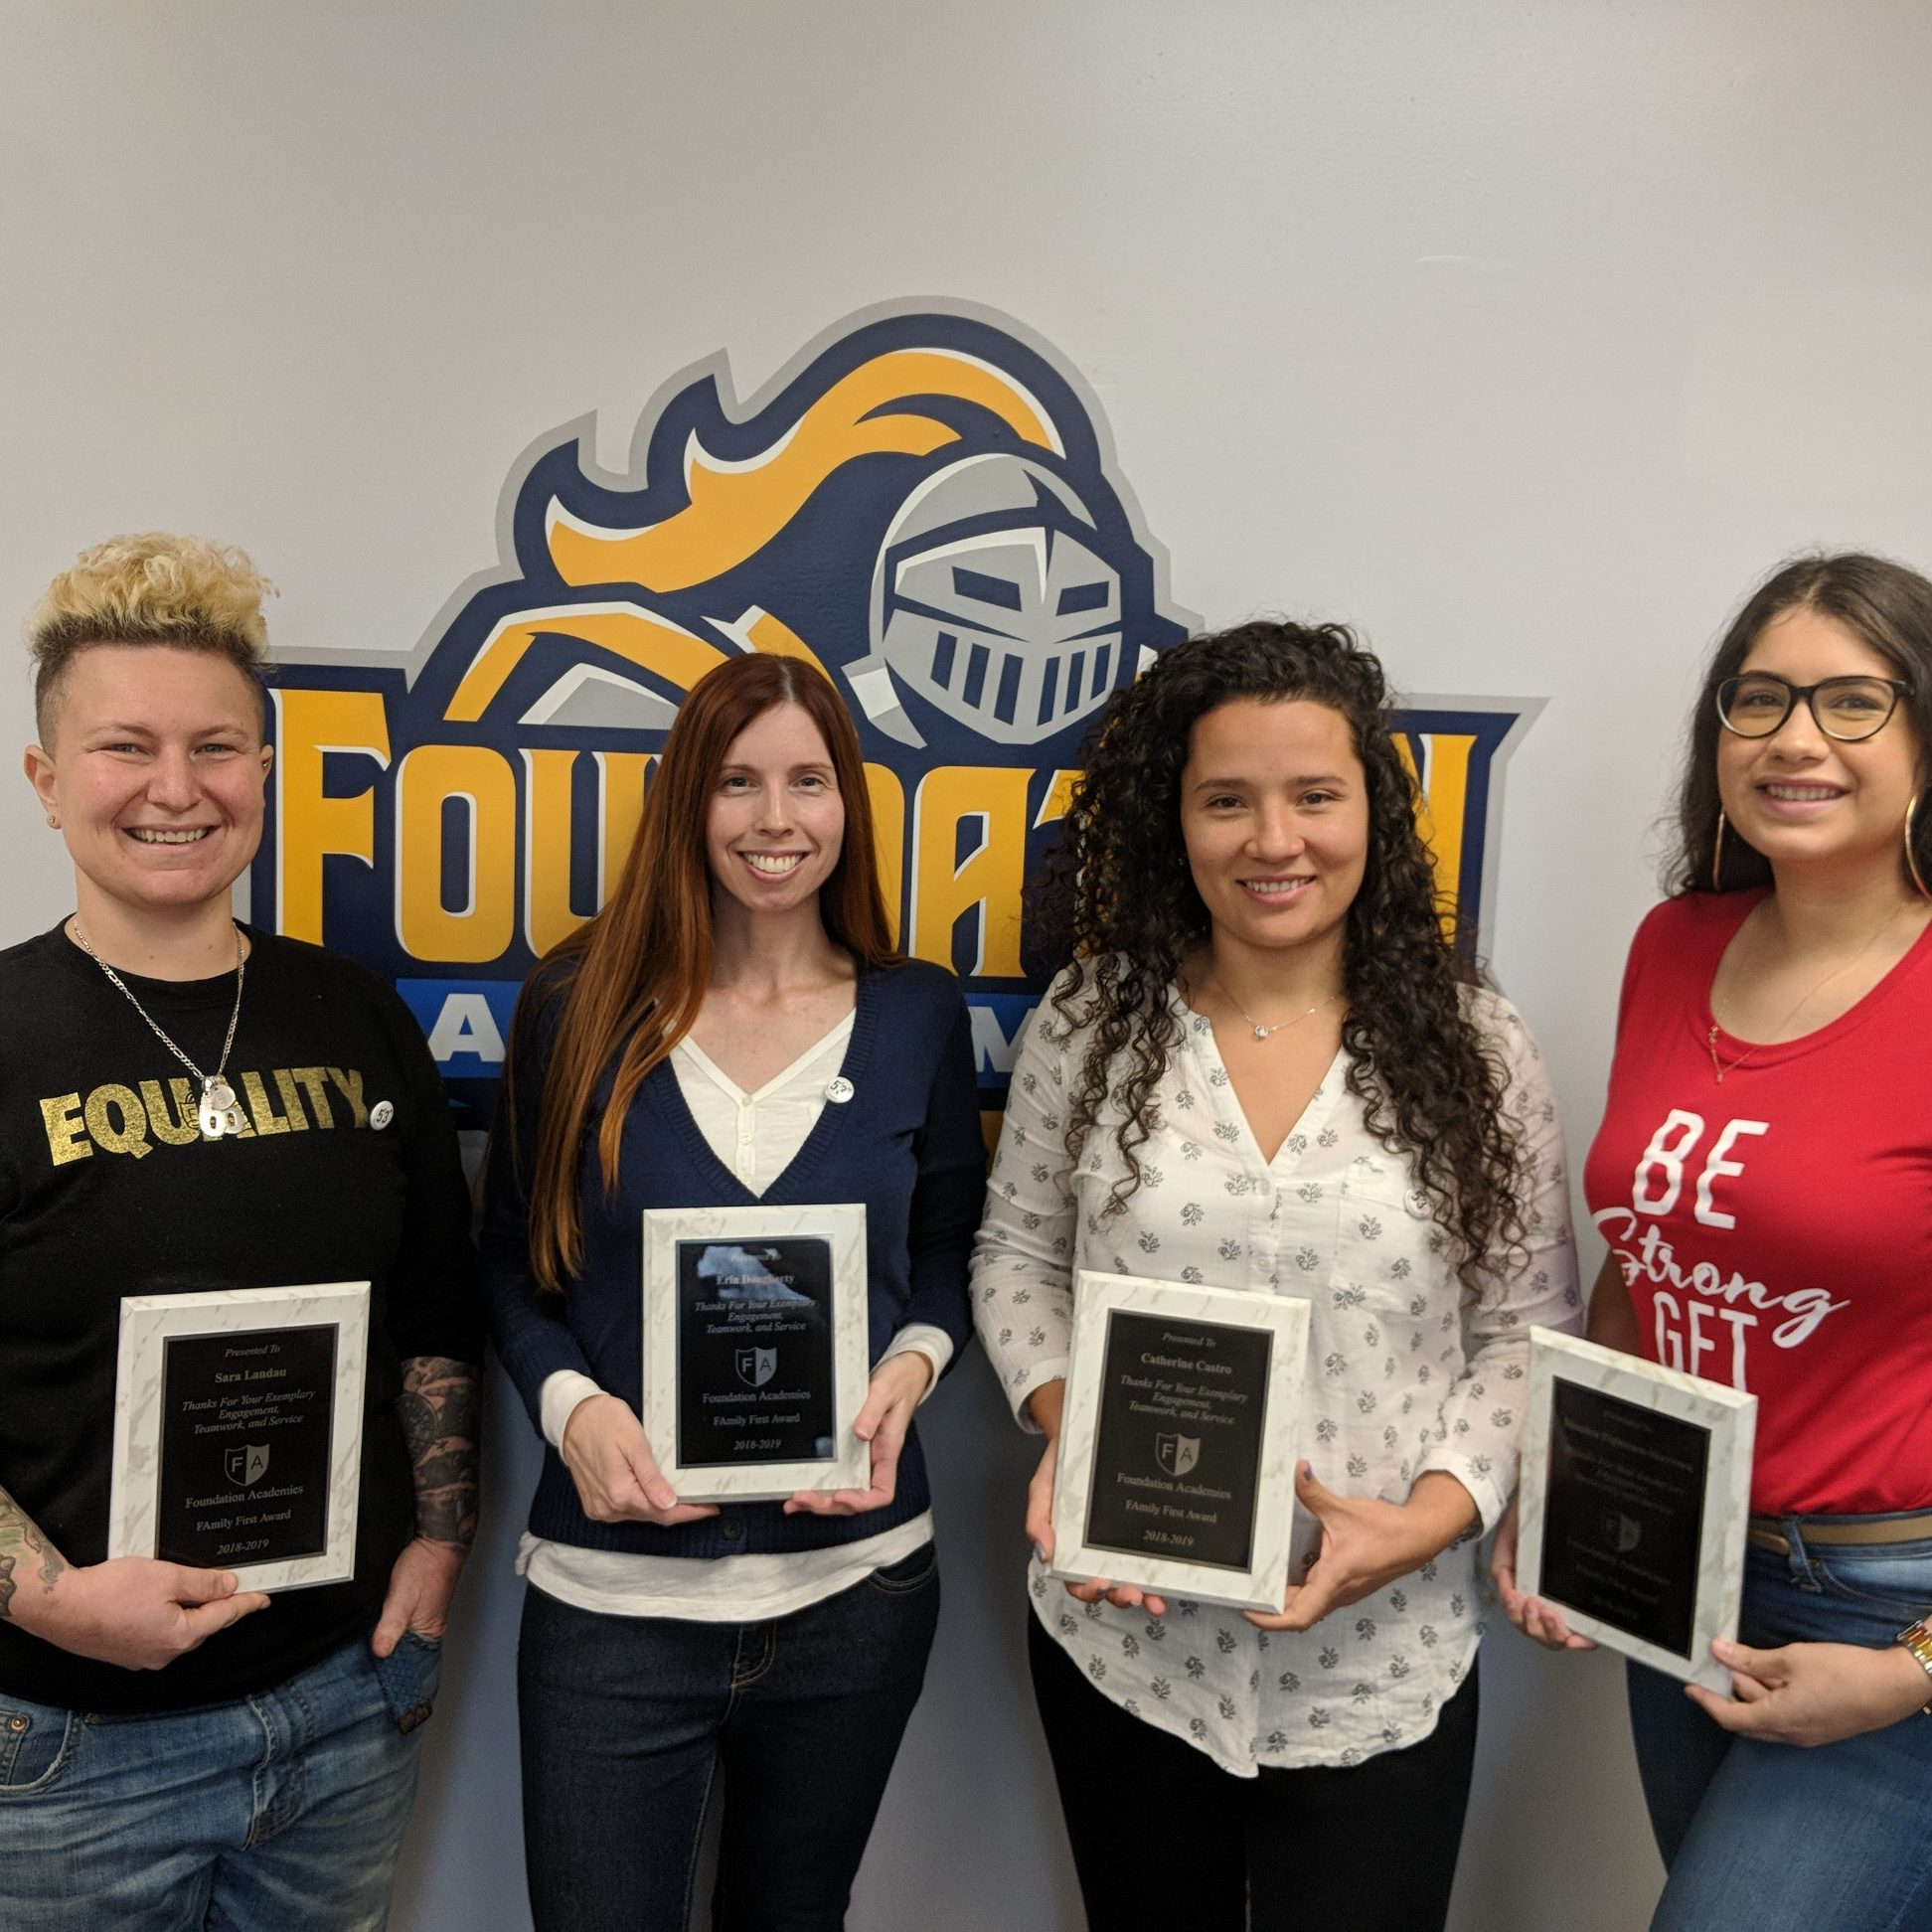 FAmily First Award 2018